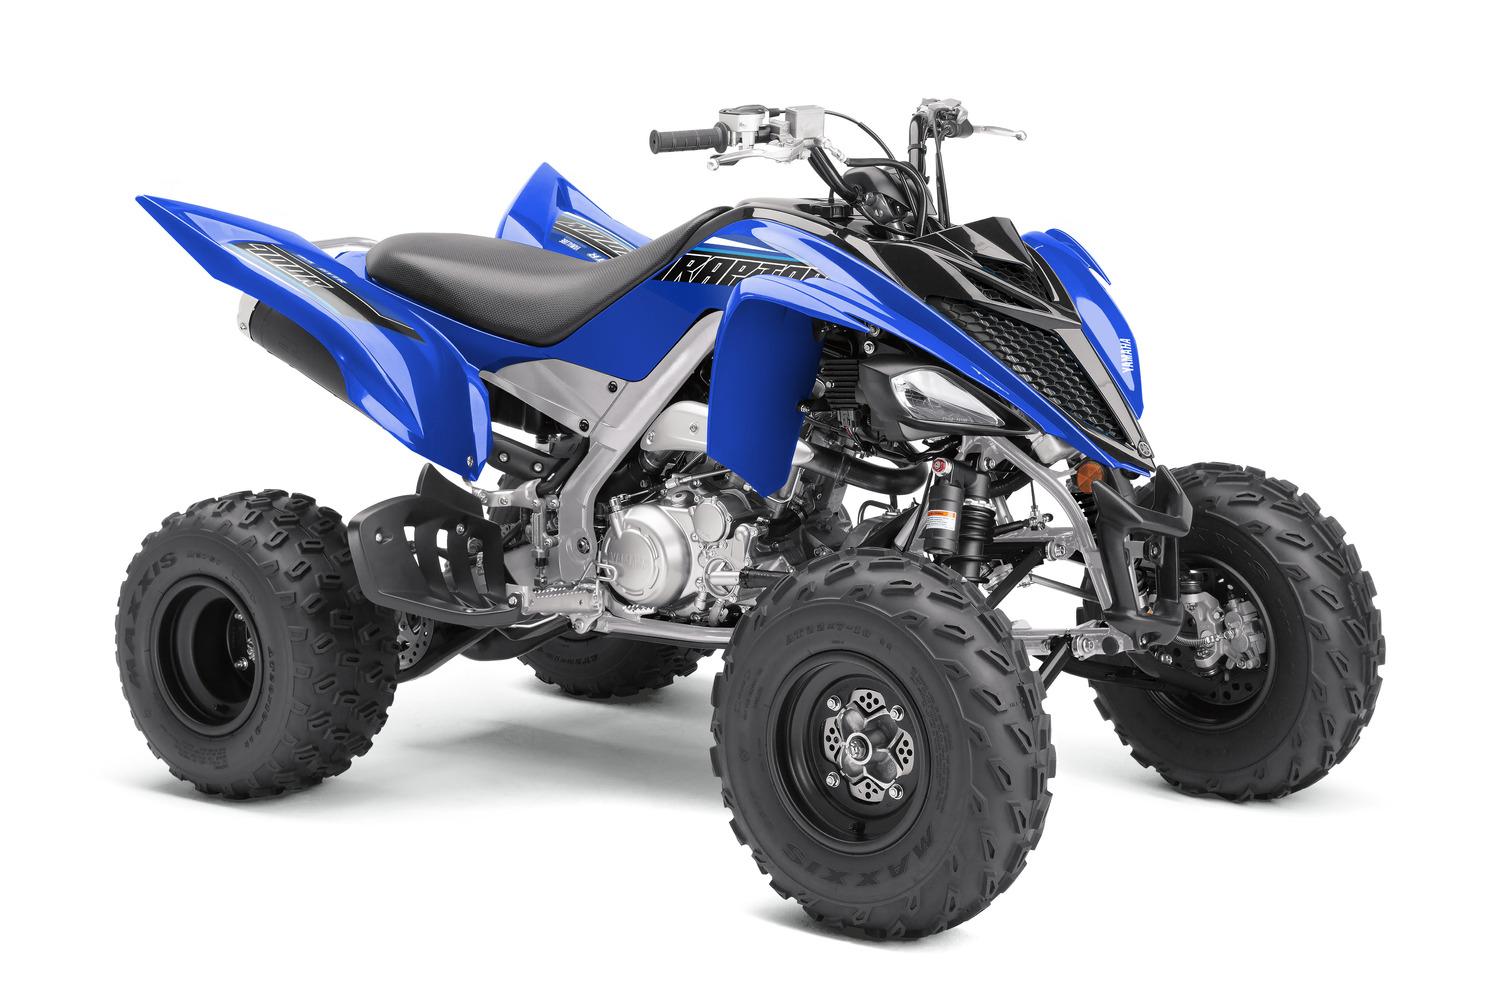 2021 Yamaha Raptor 700R (1)